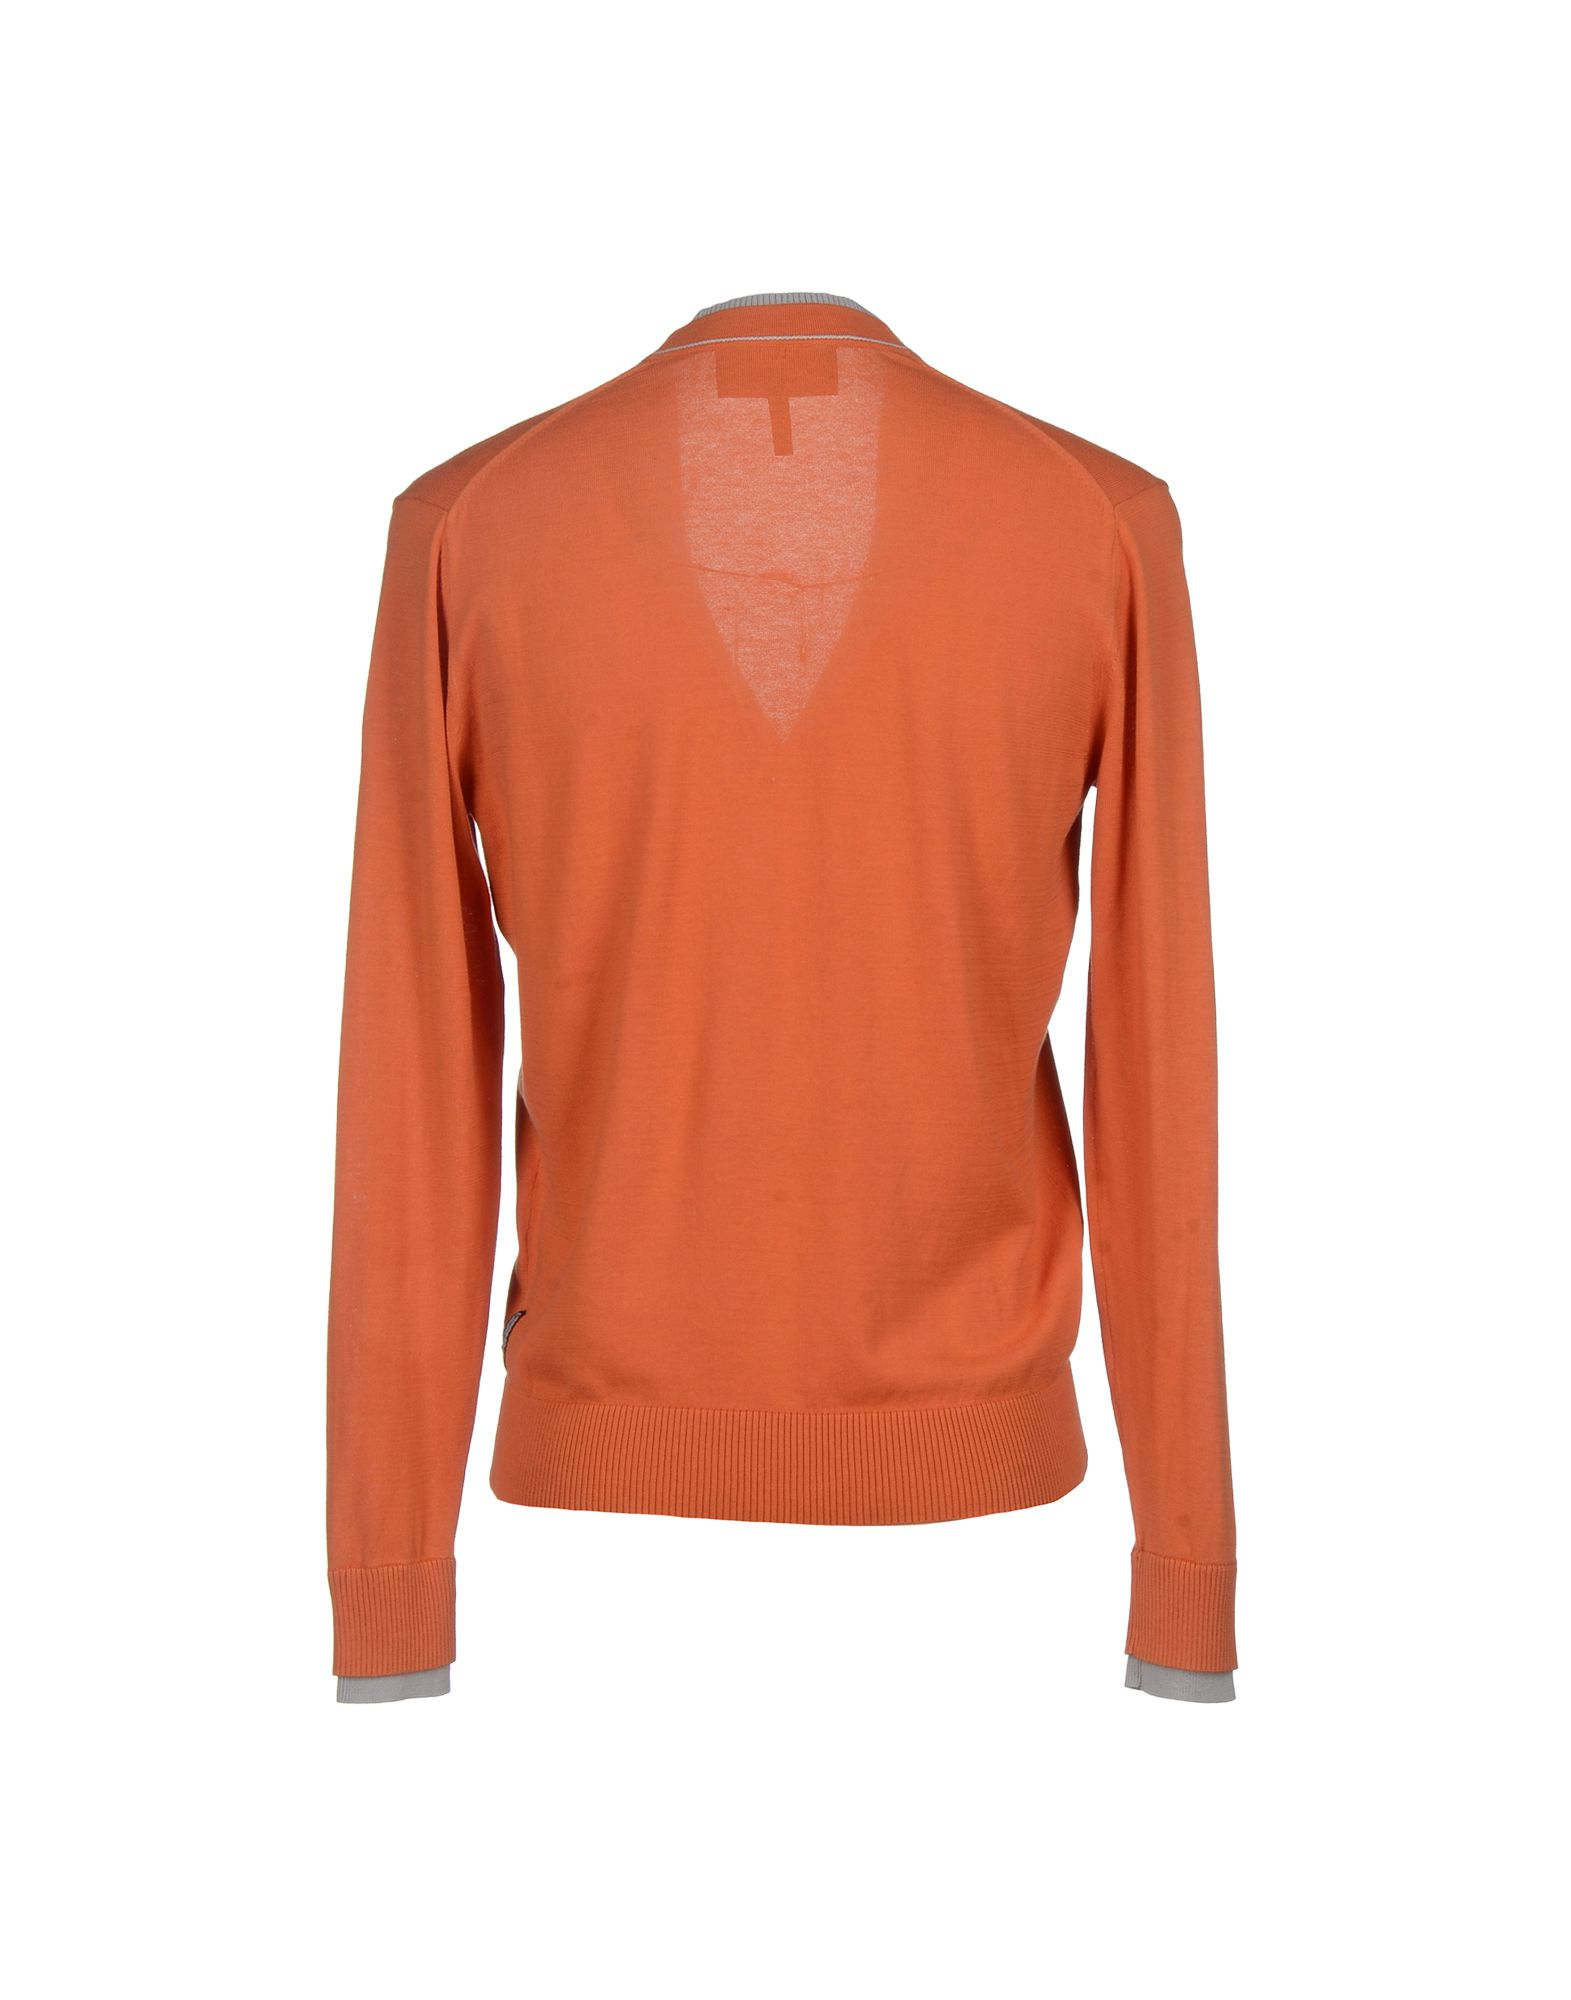 armani cardigan in orange for lyst